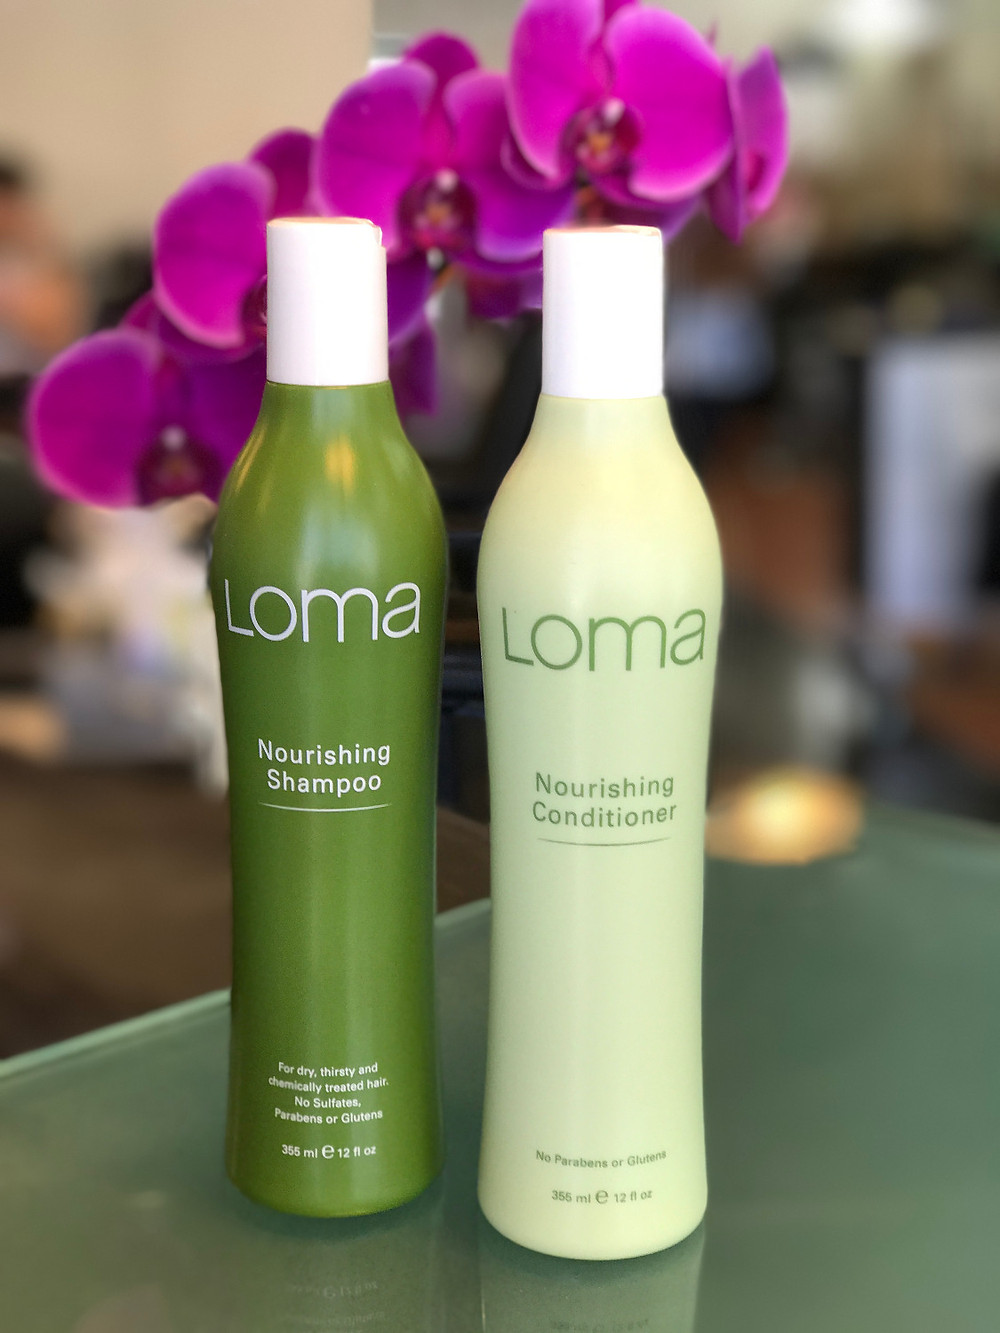 Loma Nourishing Shampoo & Conditioner